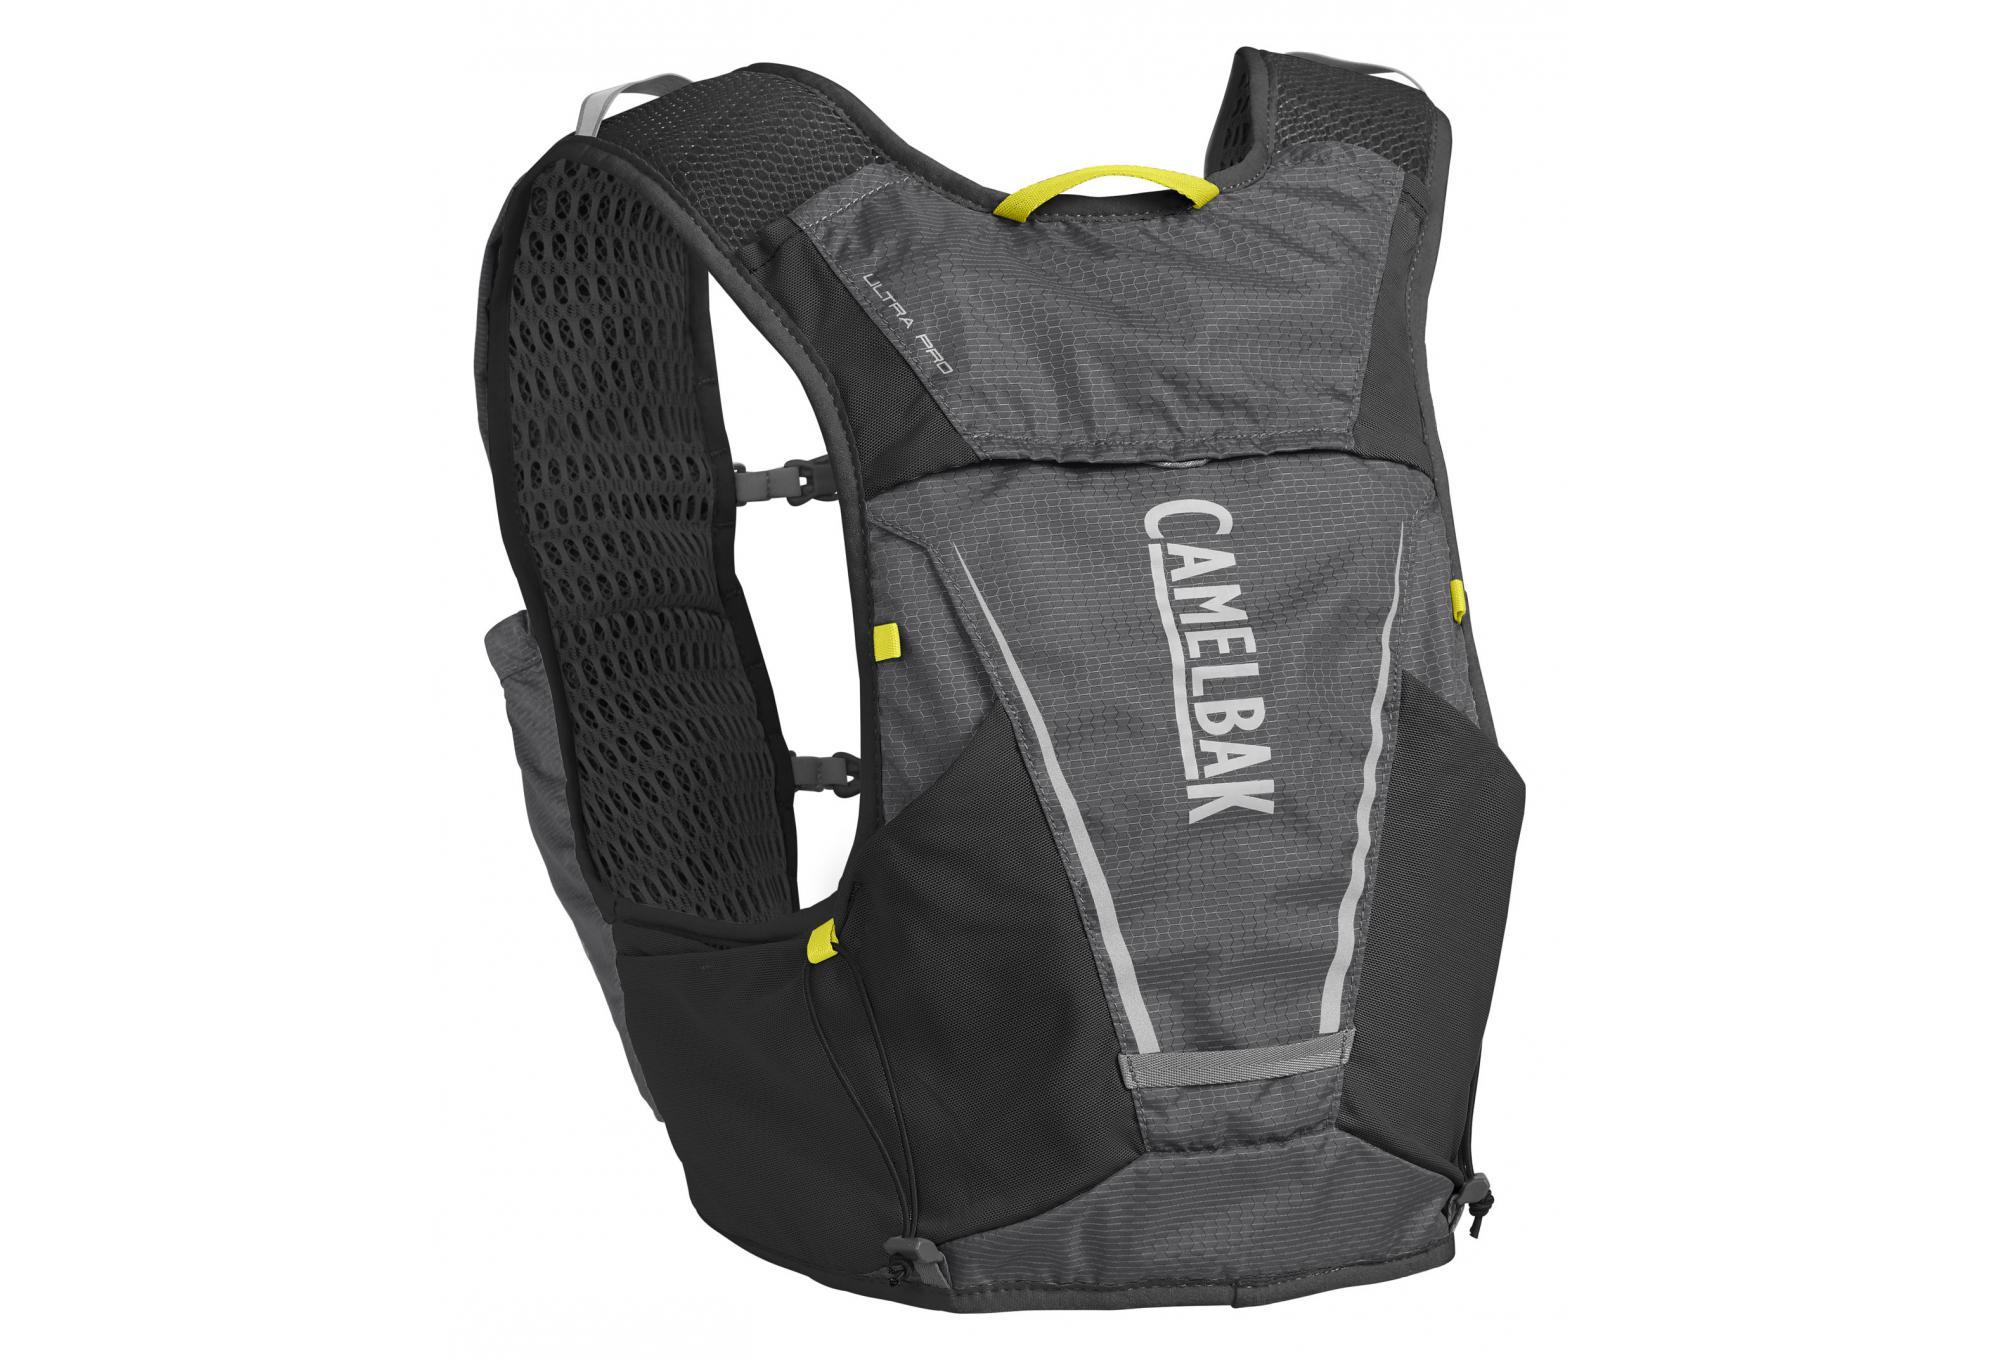 91afdeff04 Camelbak Hydratation Bag Ultra Pro Vest + 2 Water Bottles Black    Alltricks.com